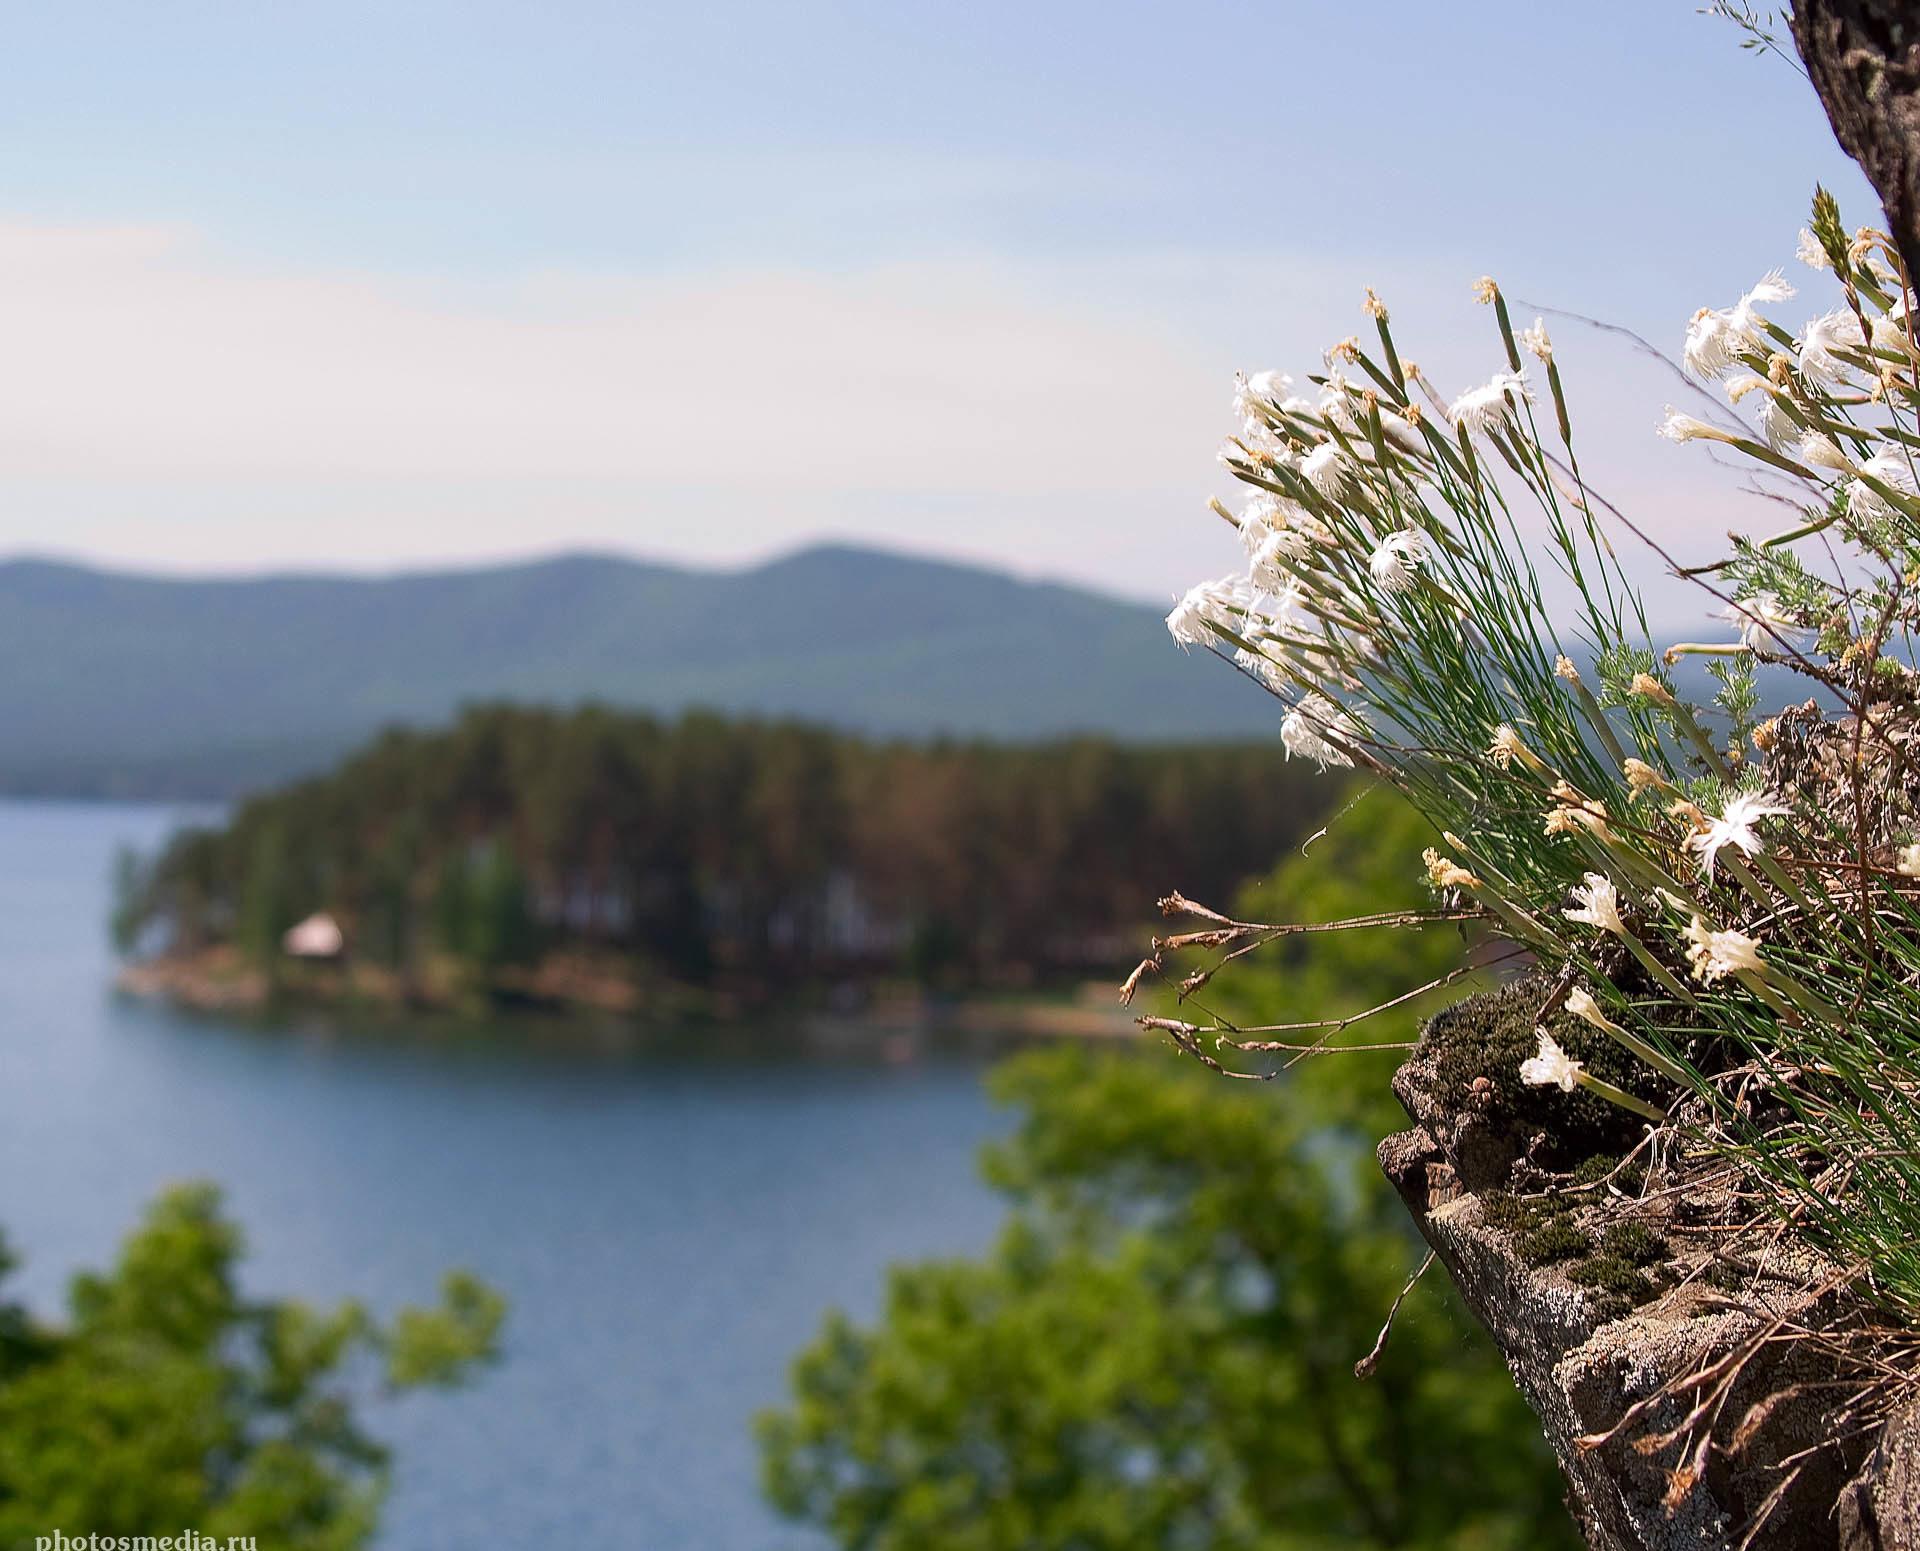 Озеро Тургояк. Фотограф Вадим Кукшинов